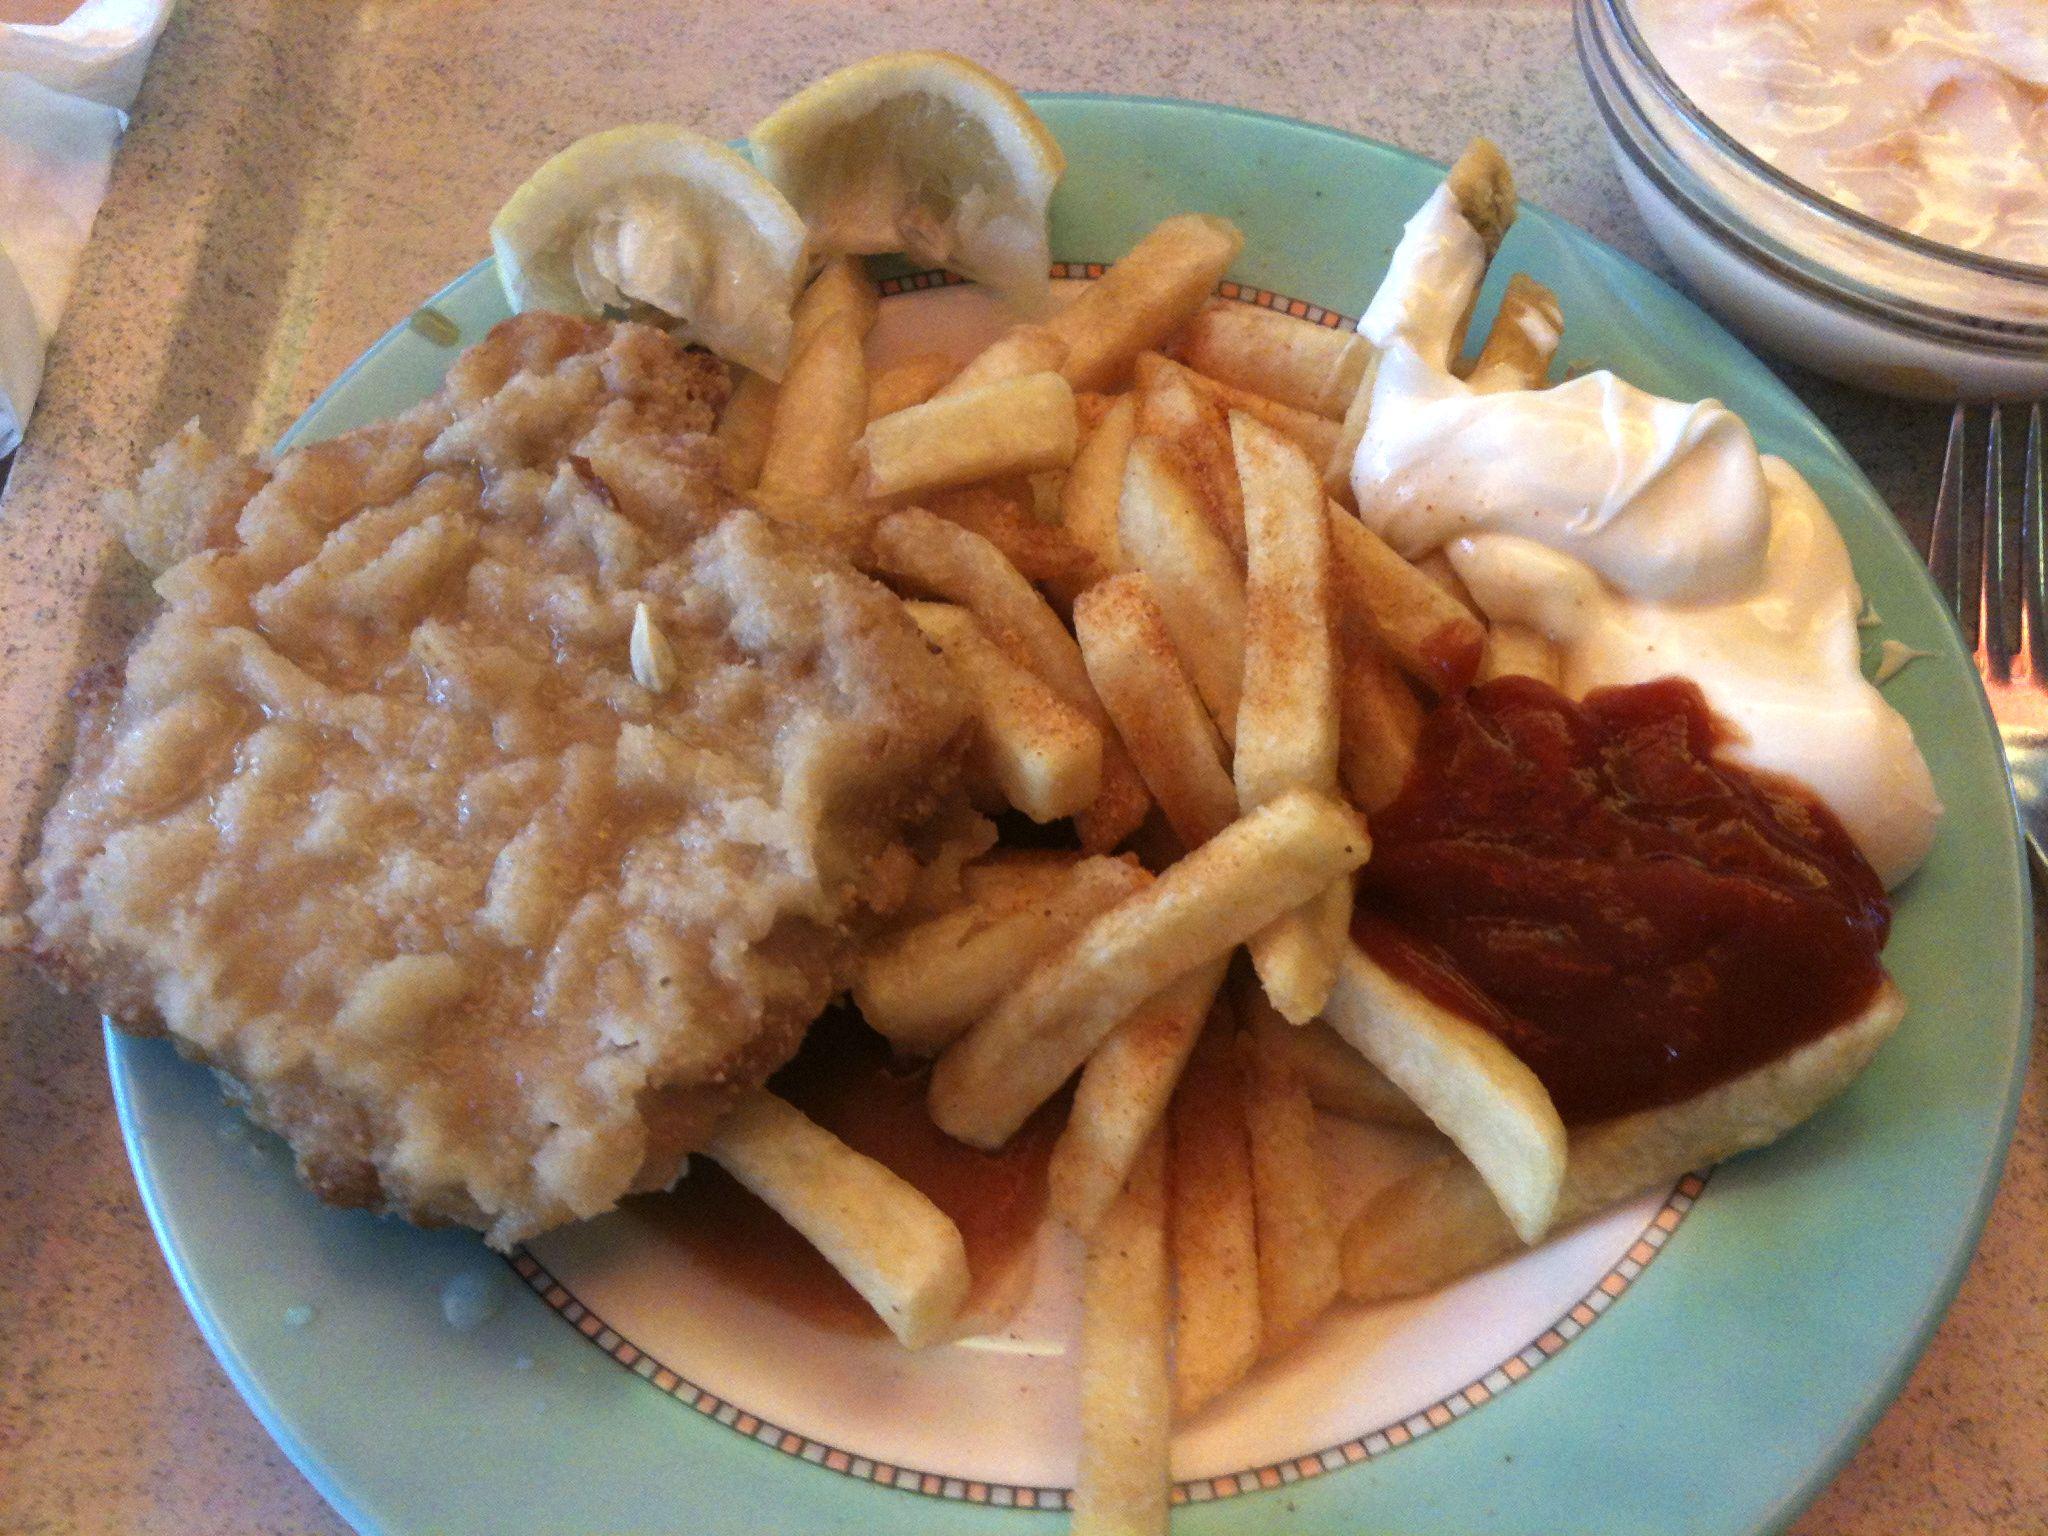 https://foodloader.net/nico_2011-11-07_paniertes-schnitzel-mit-pommes-frites.jpg